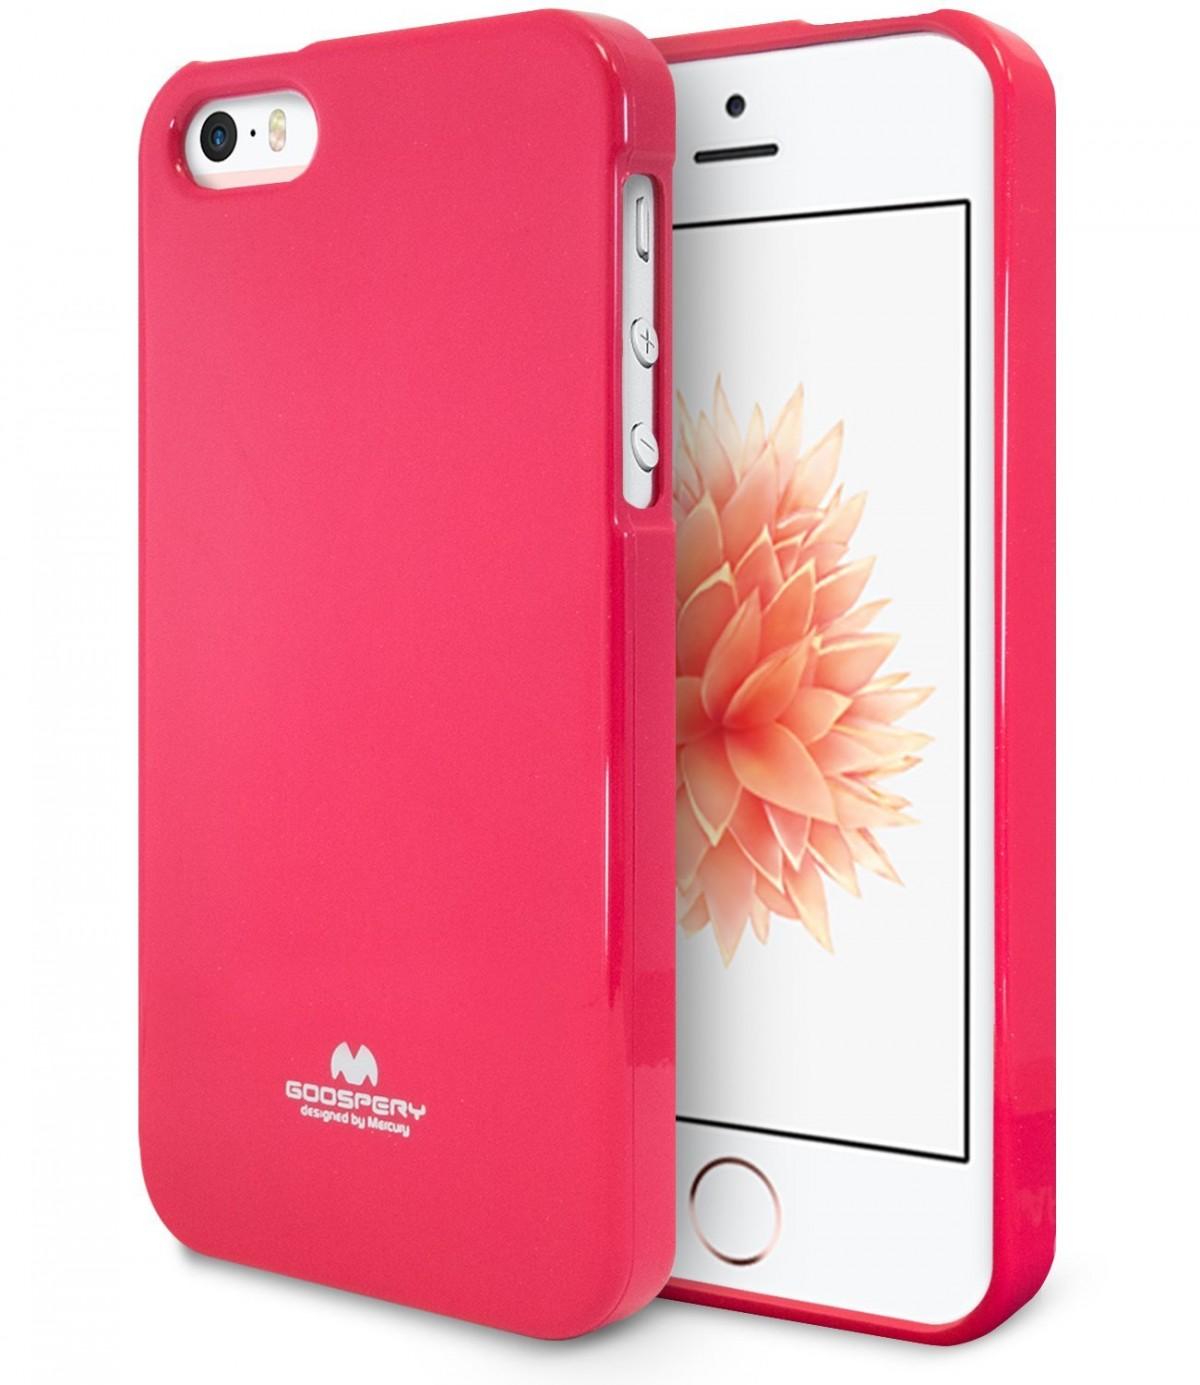 Pouzdro Mercury Apple iPhone 5   5S   SE Jelly Case hot růžové e560eccbbd5